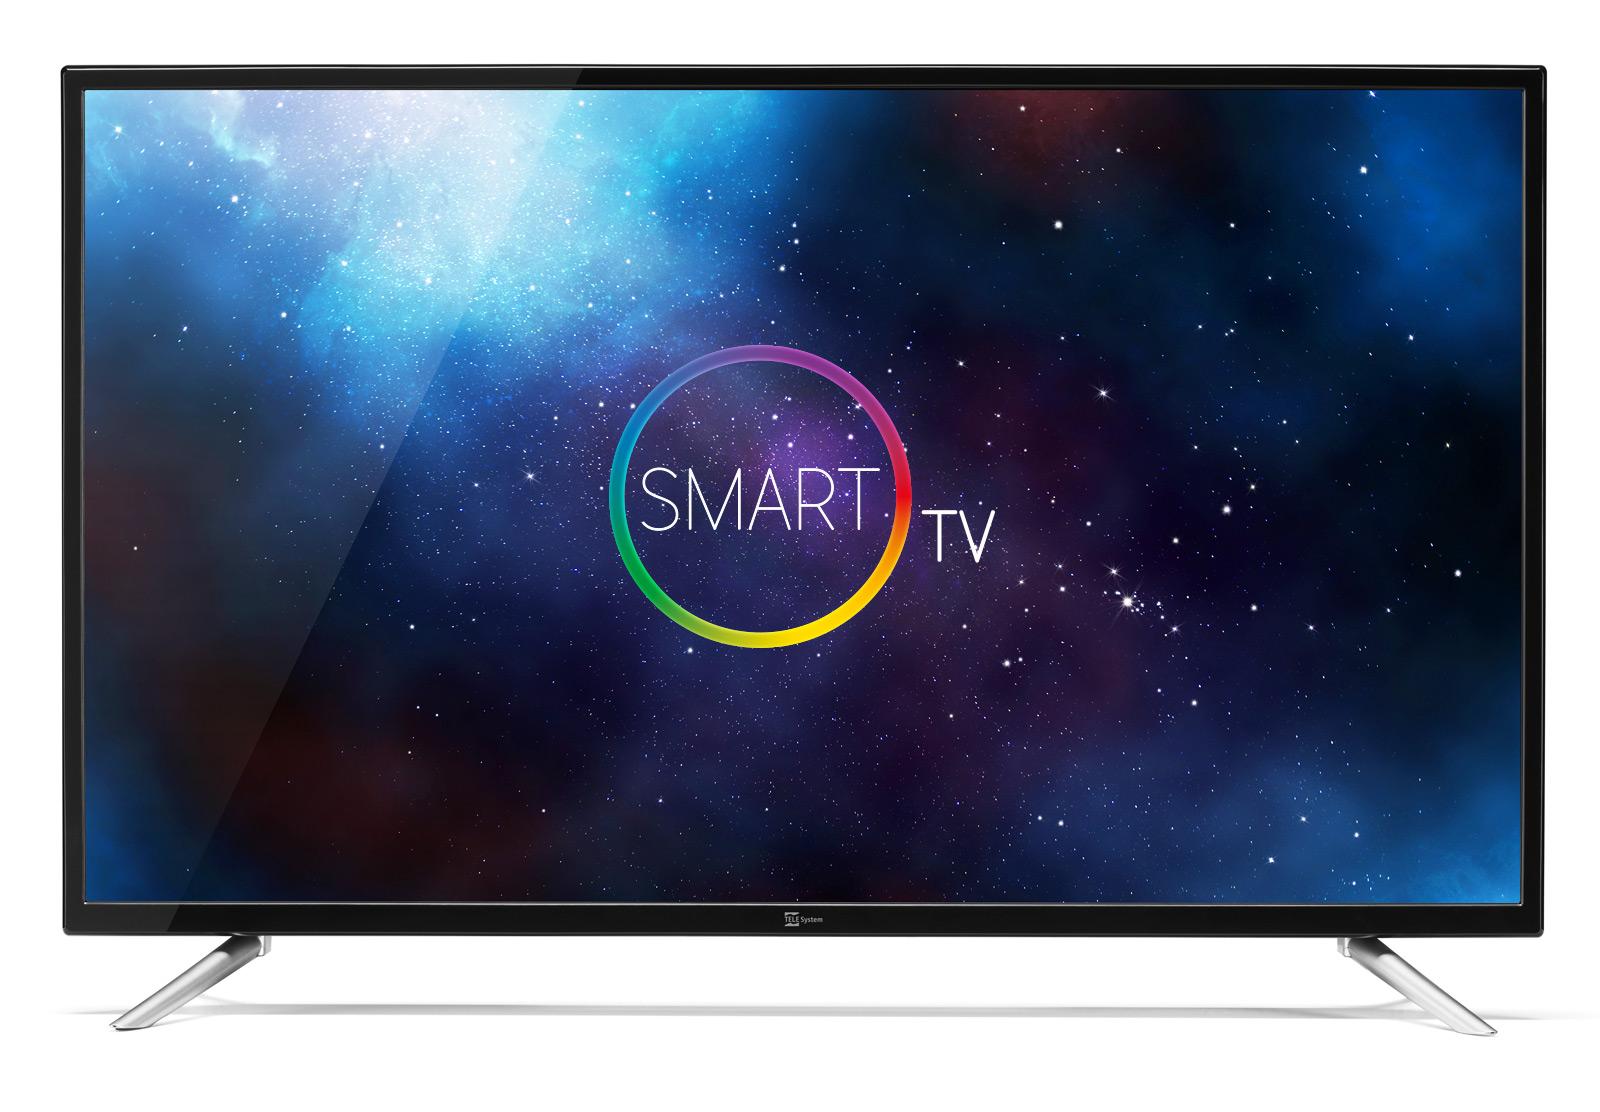 SMART TV 32 pollici LS08